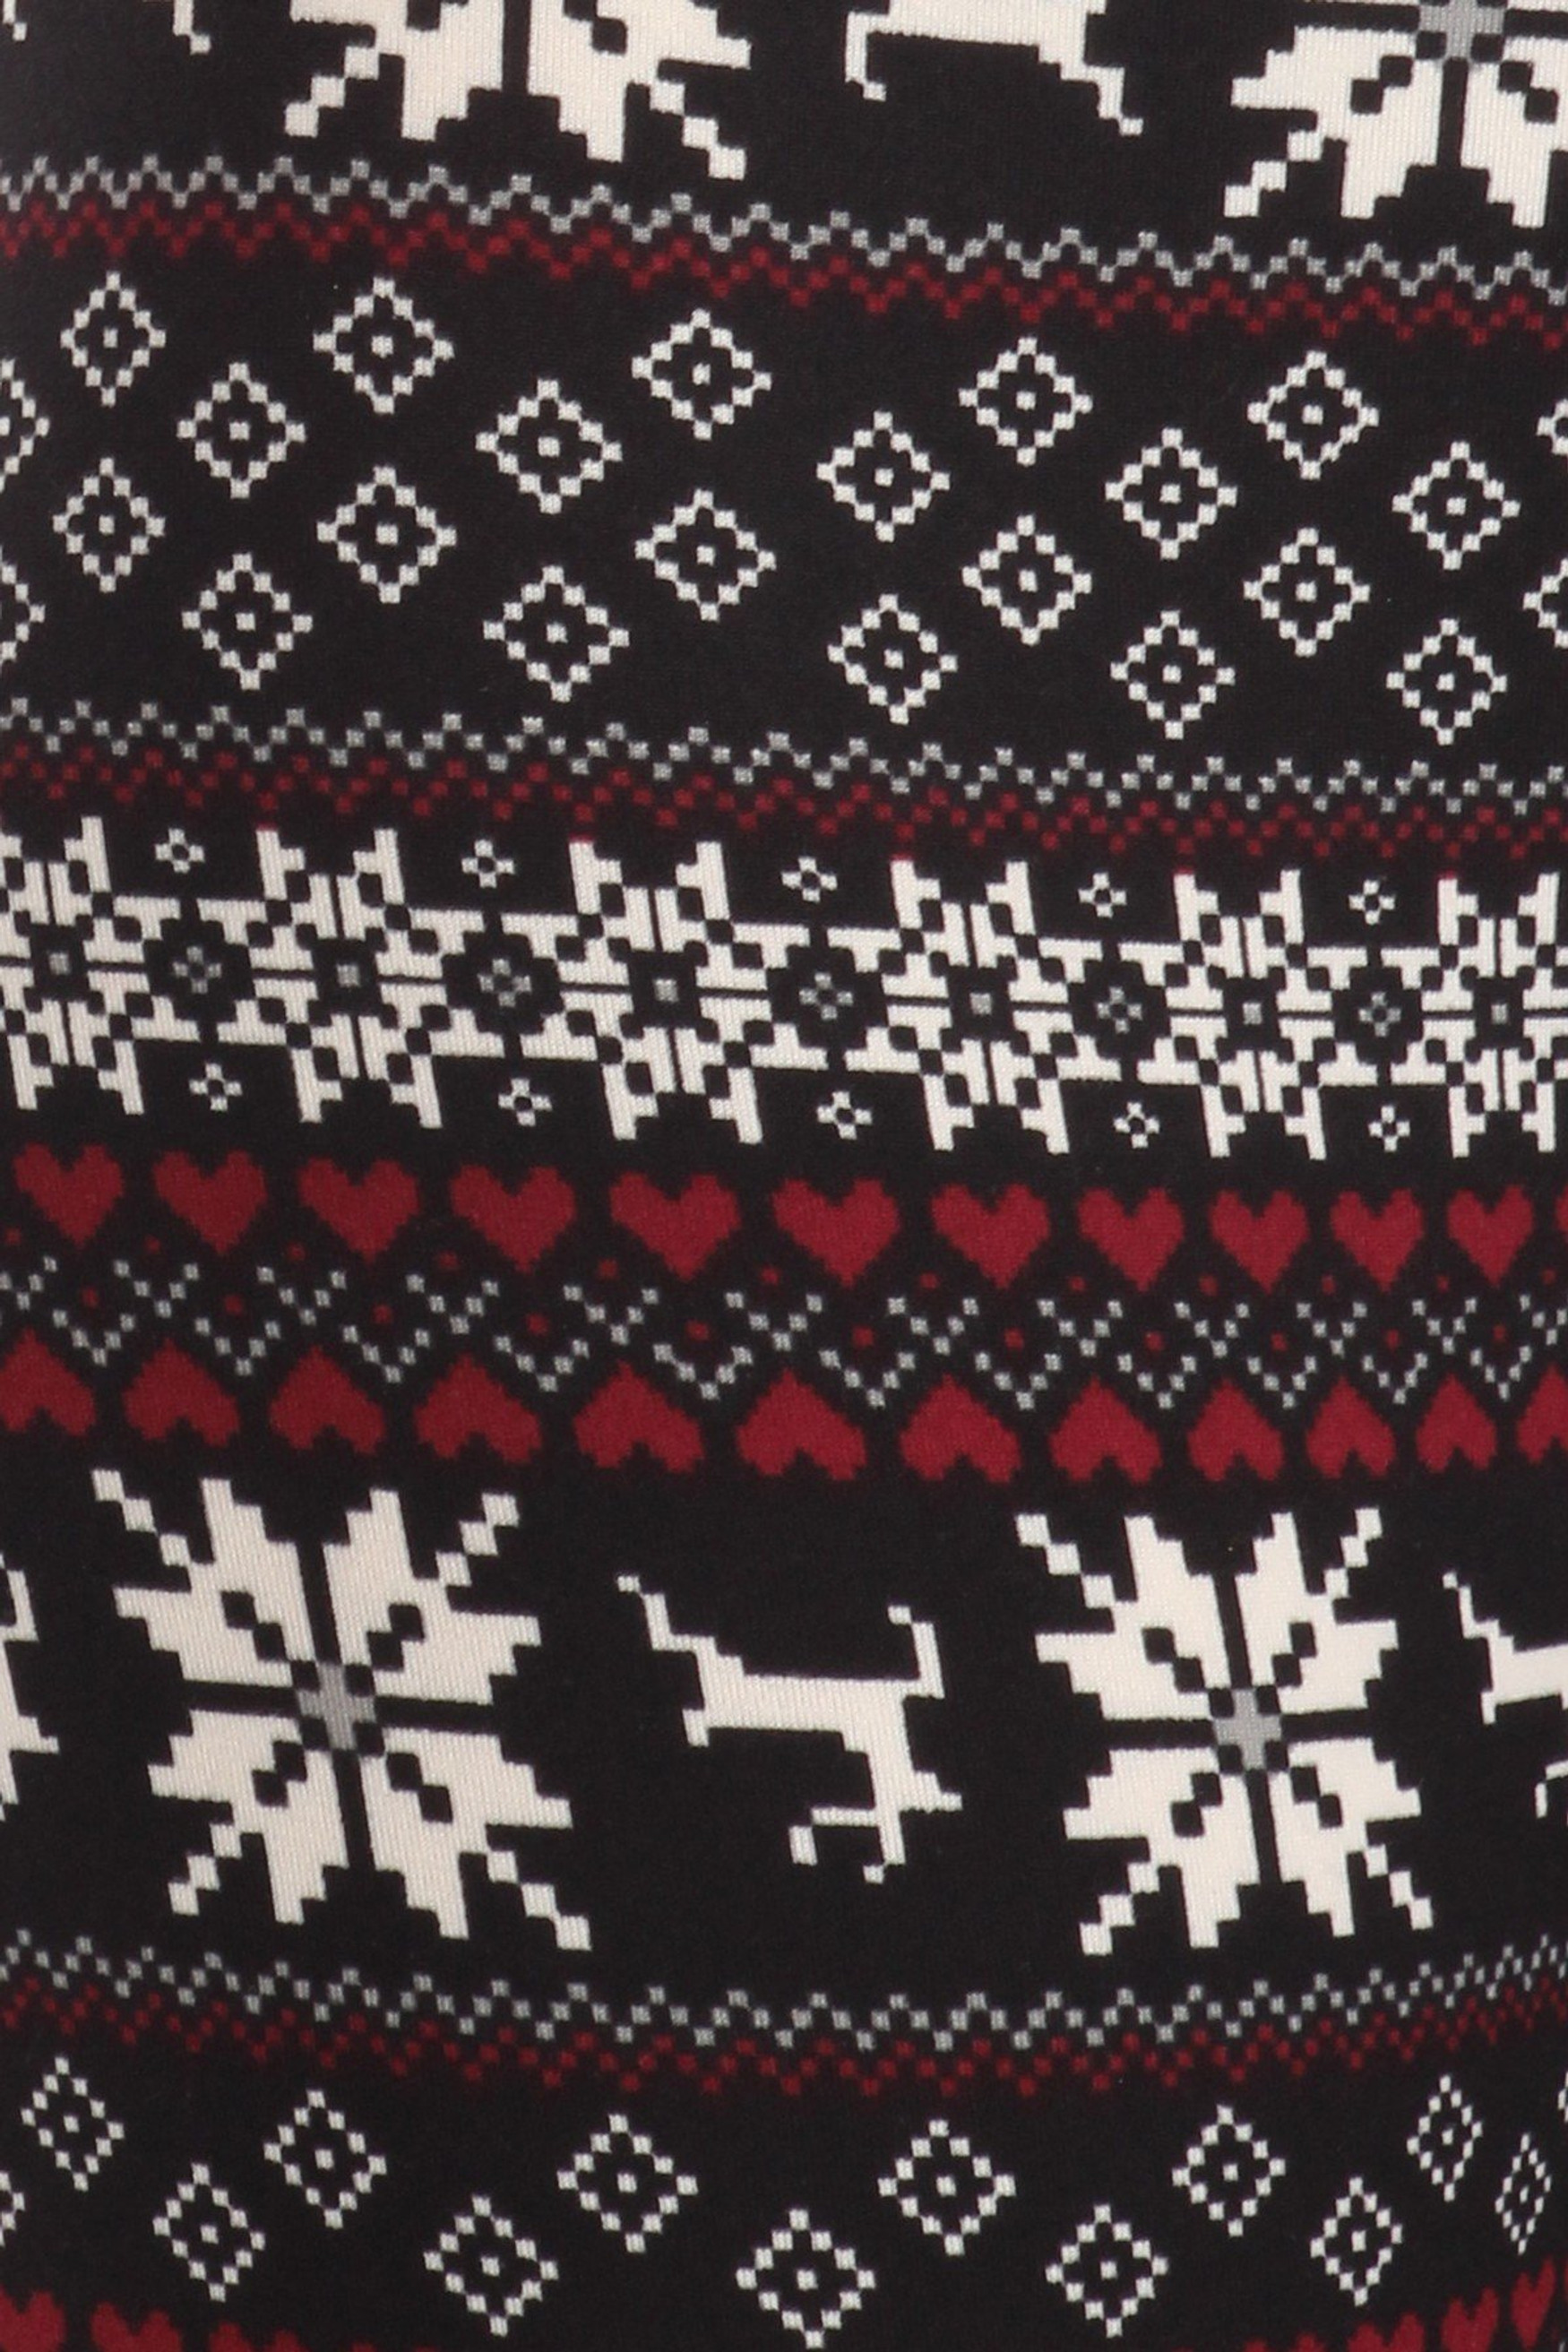 Soft Fleece Reindeer Dashing Through the Snow Holiday Leggings